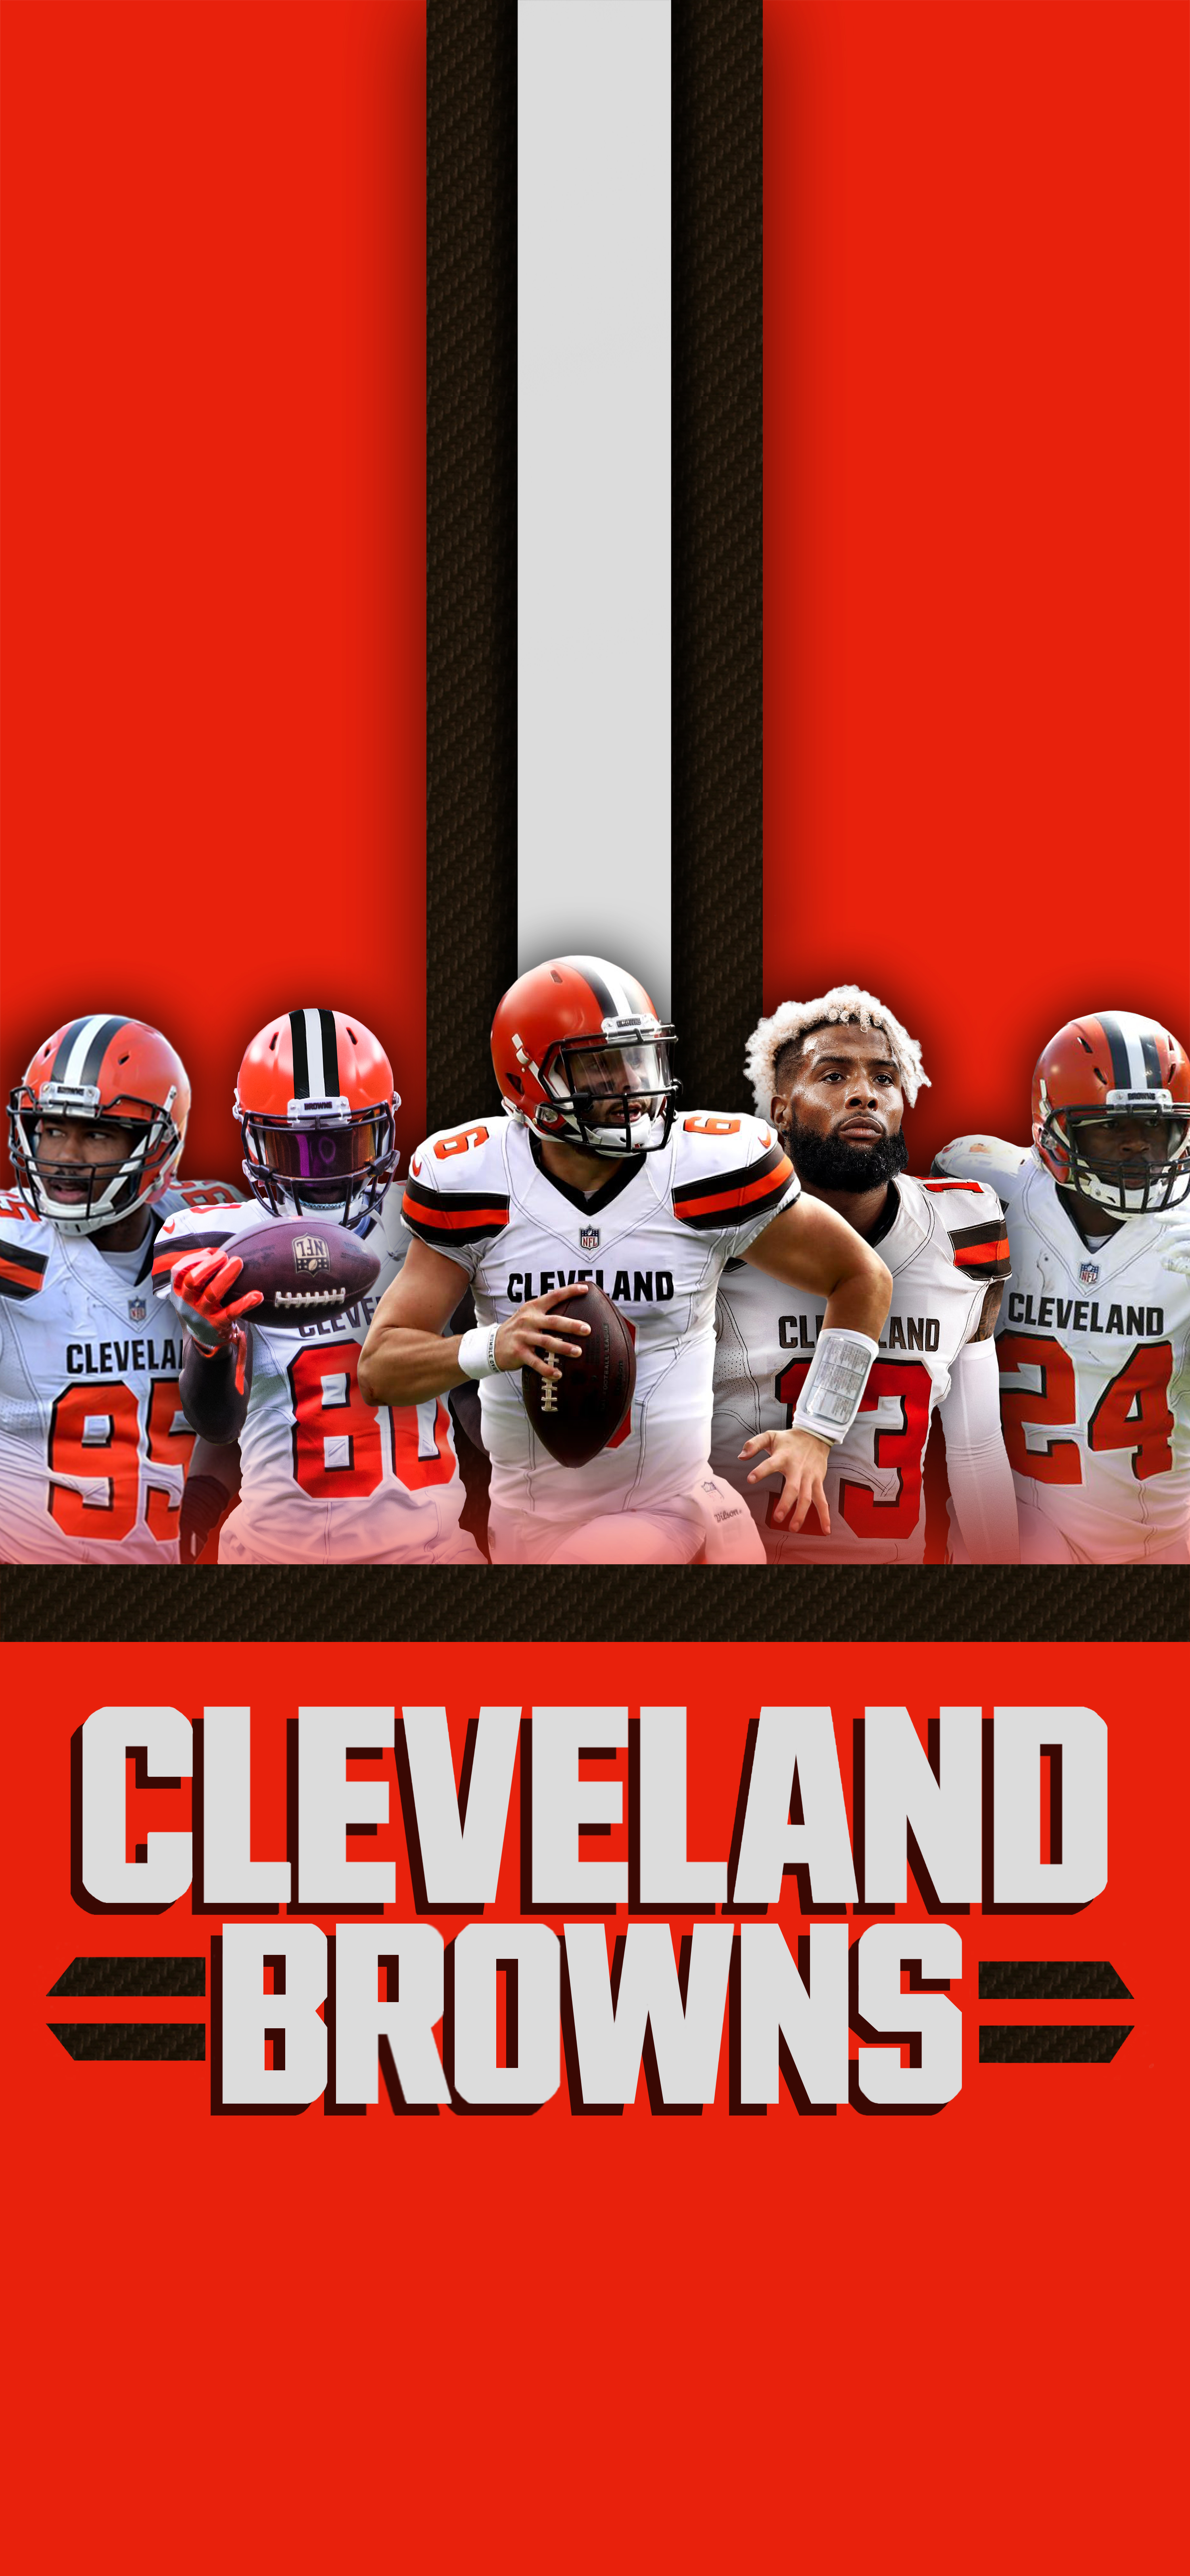 Cleveland Browns Wallpaper   Album on Imgur 3000x6495